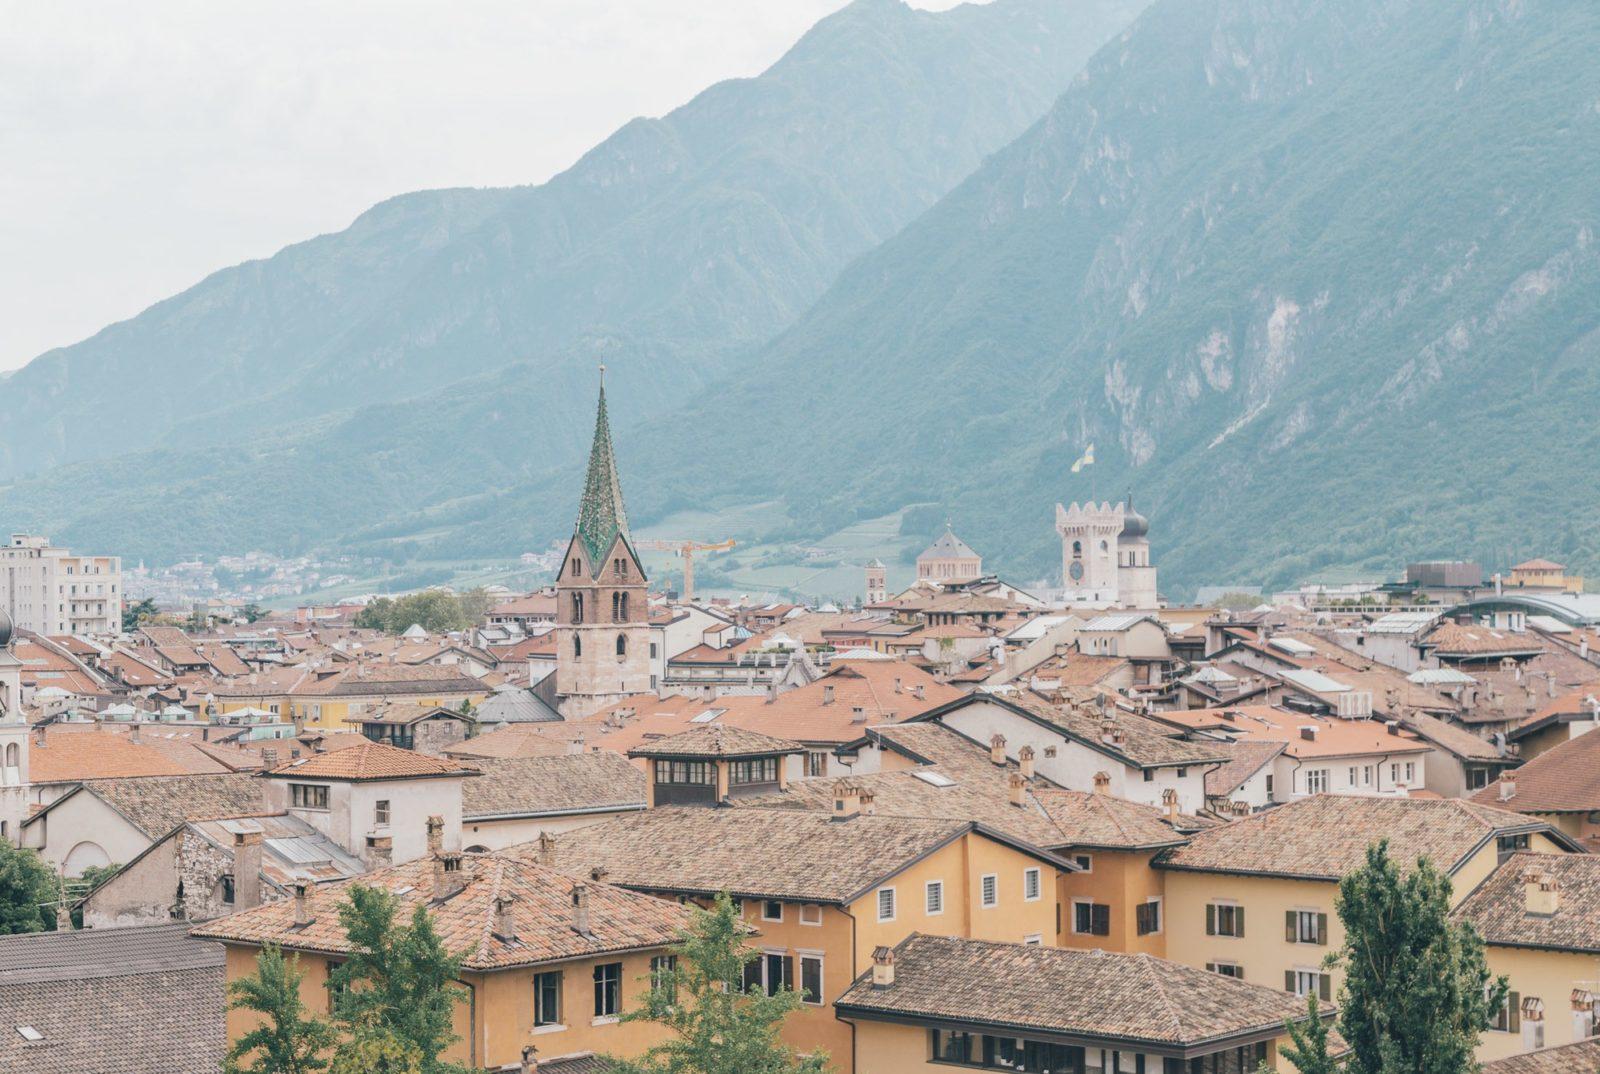 Trento, Northern Italy